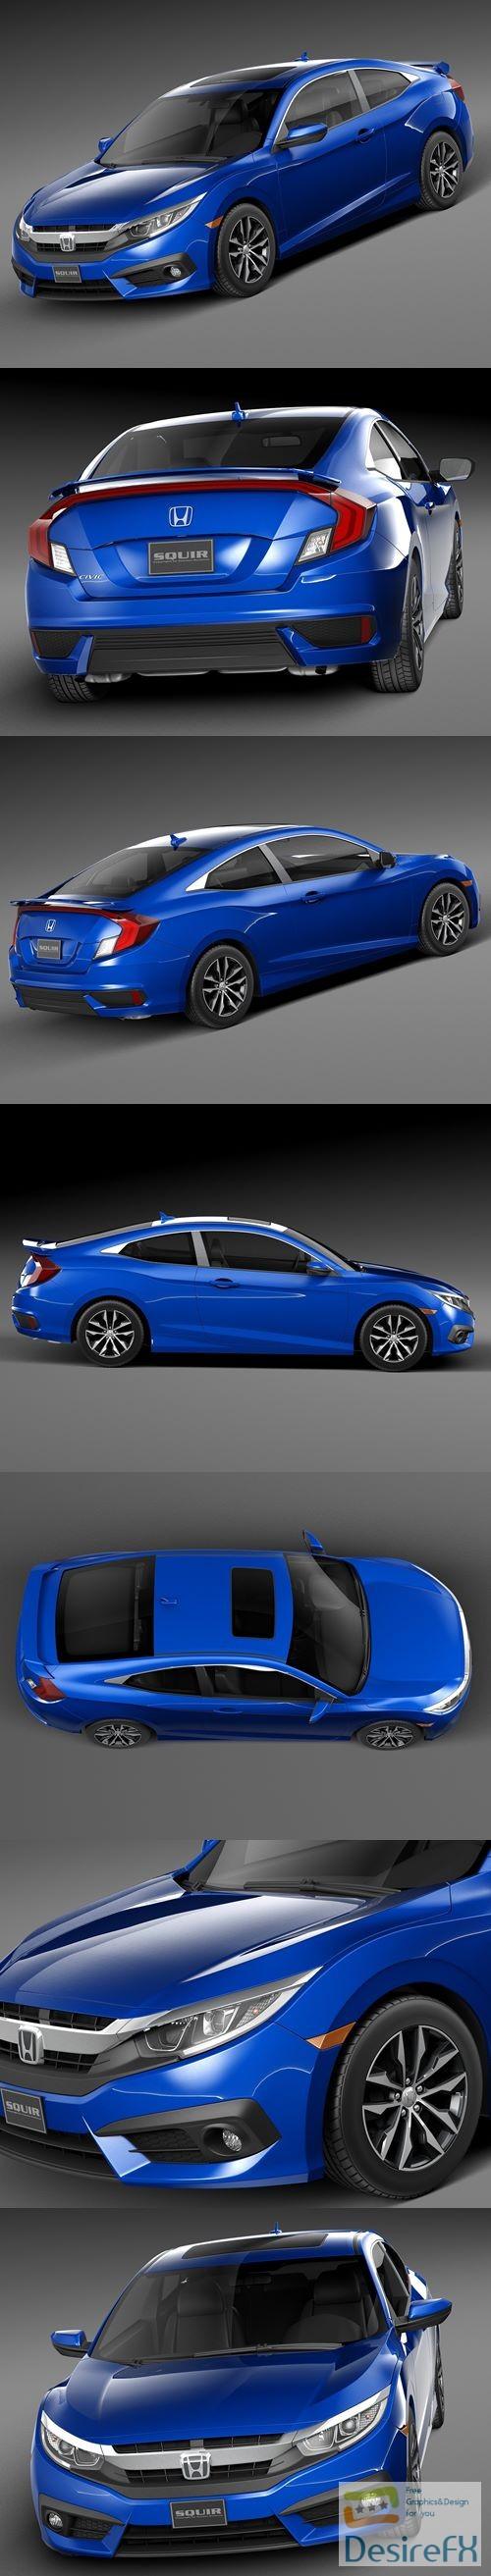 3d-models - Honda Civic Coupe 2016 3D Model